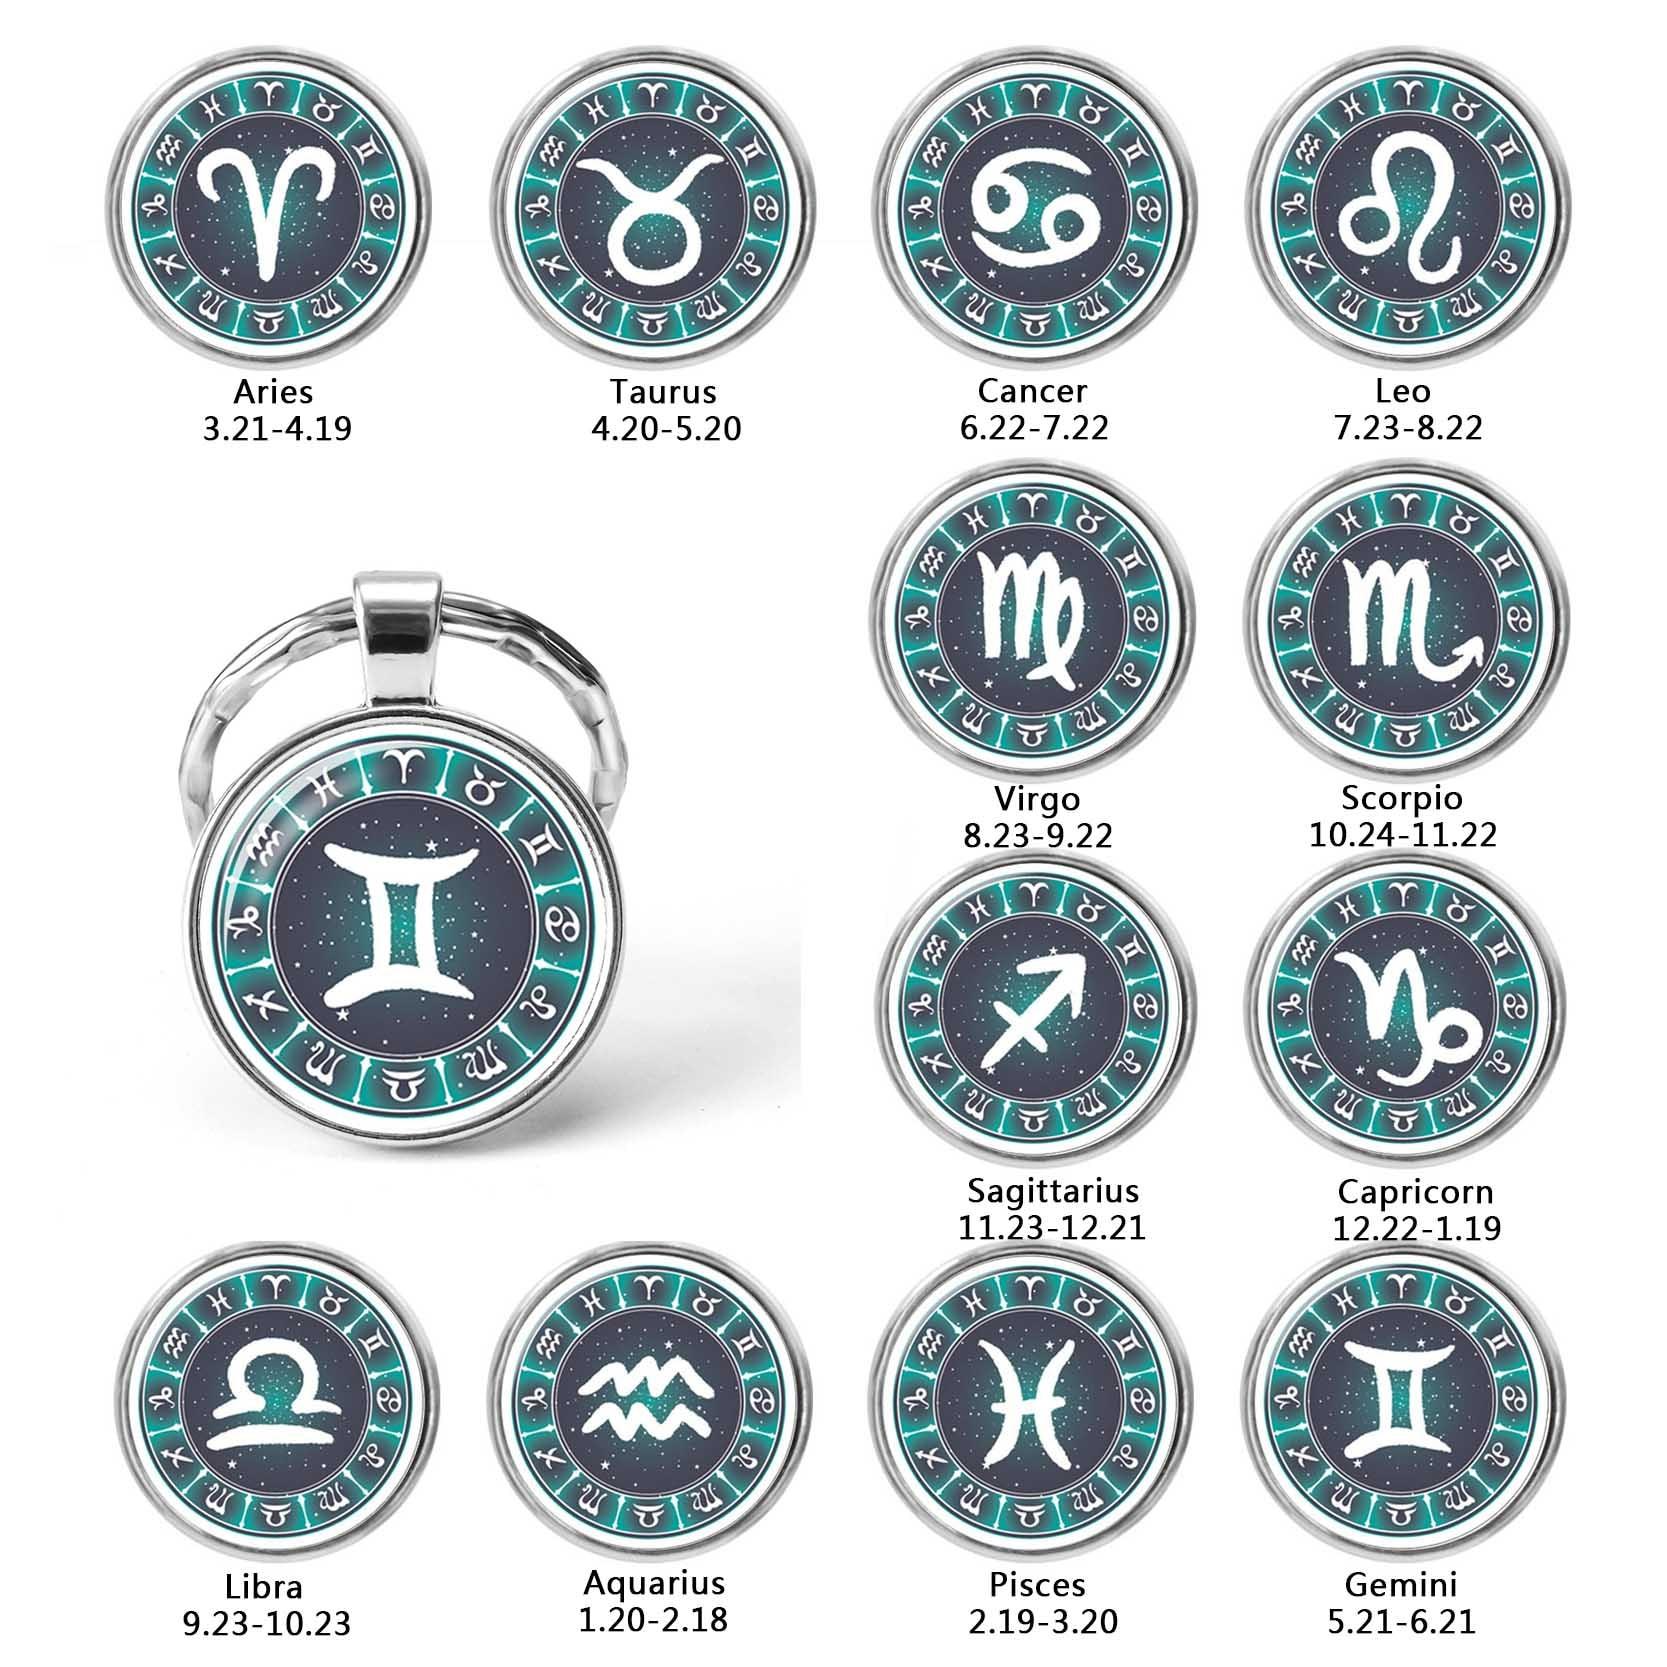 12 Constellation Leo Virgo Key Chains Glass Cabochon Pendant Zodiac Sign Key Rings Silver Plated Bag Pendant Birthday Gift